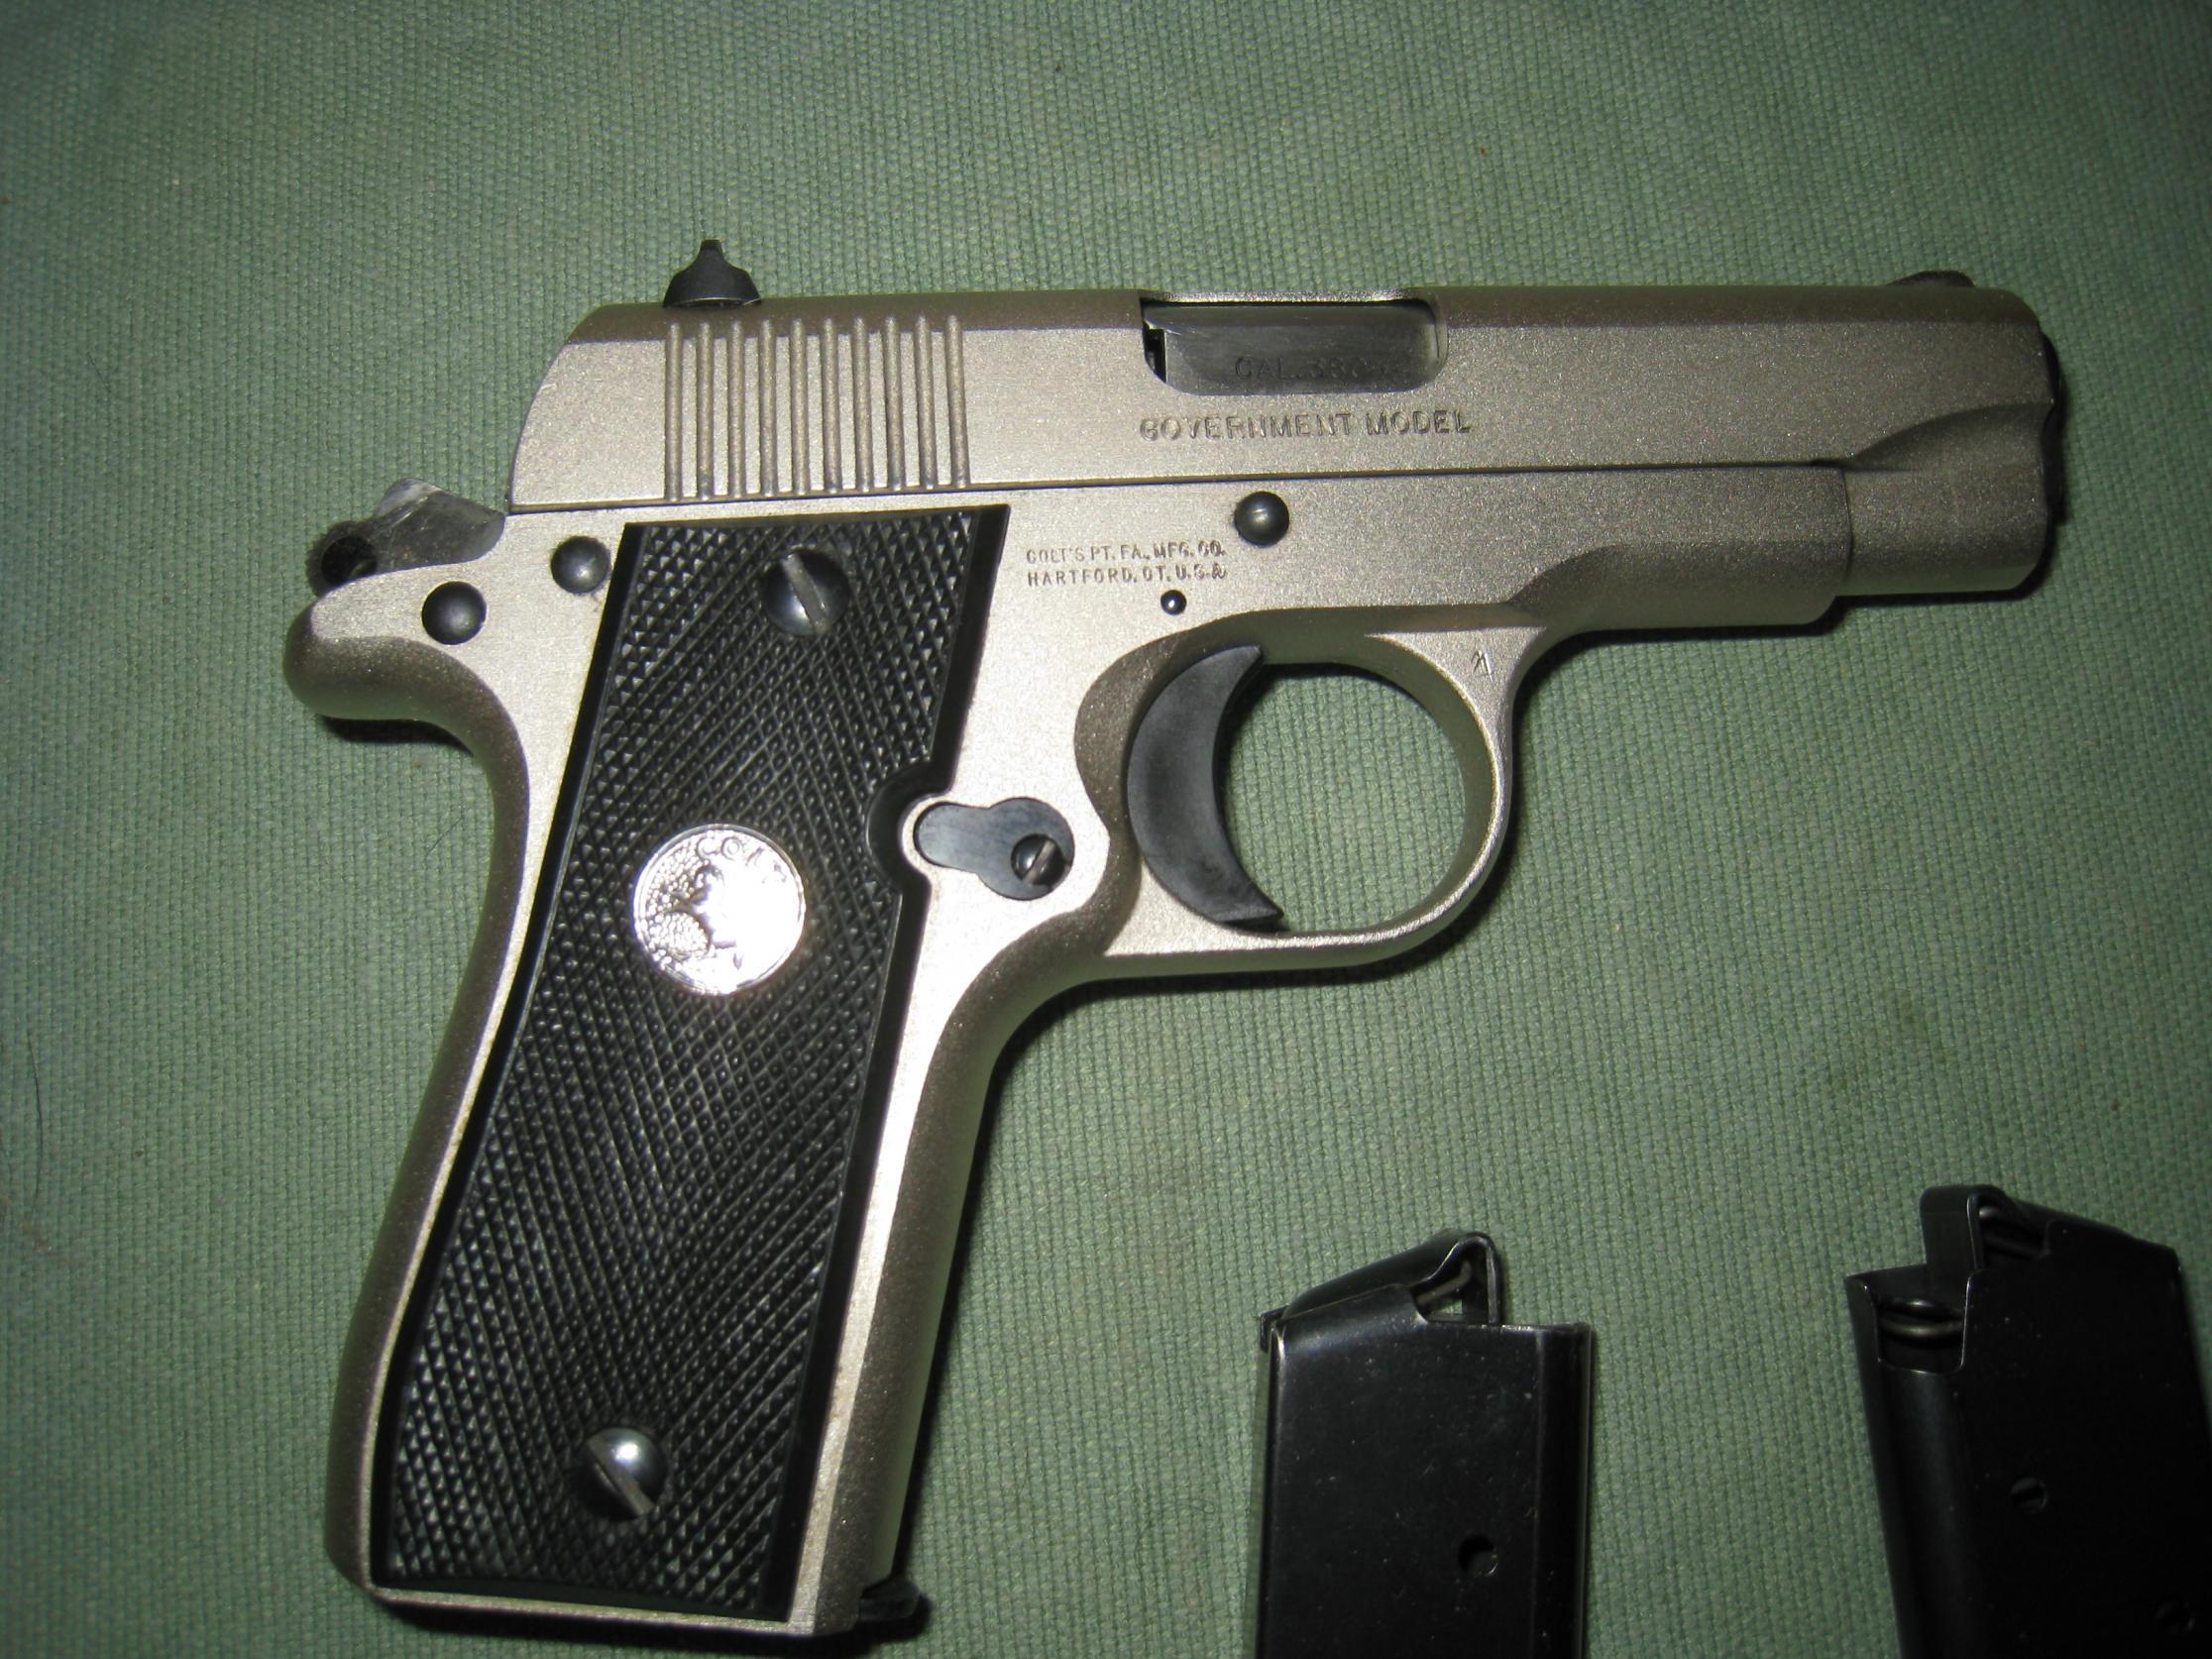 WTS Colt MkIV/Series 80 Govt. Model 380. - [KY]-img_0768.jpg